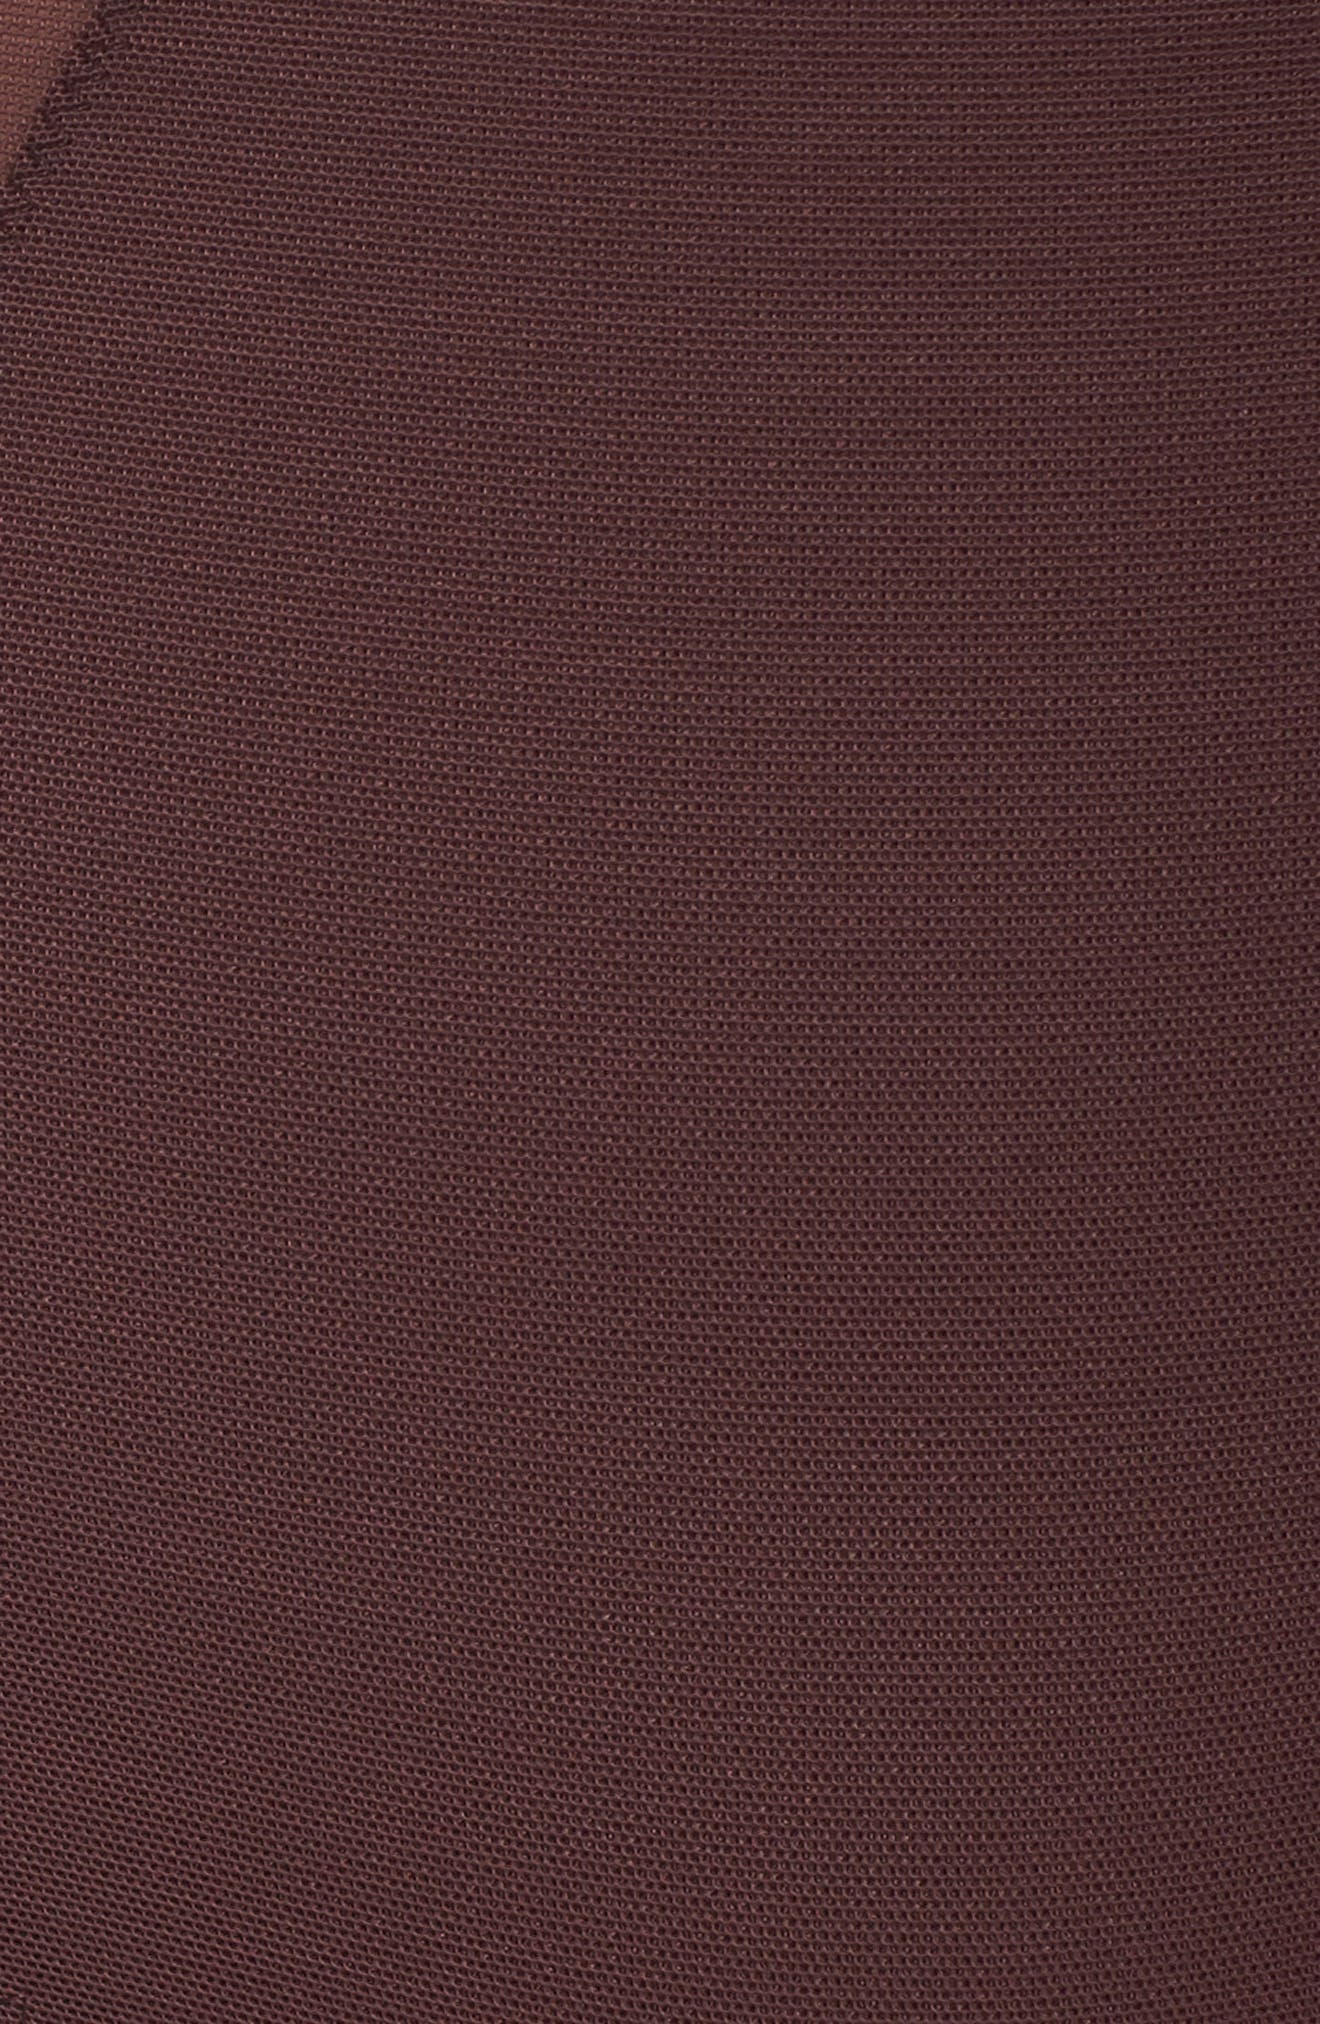 Spotlight On Lace Briefs,                             Alternate thumbnail 5, color,                             GARNET